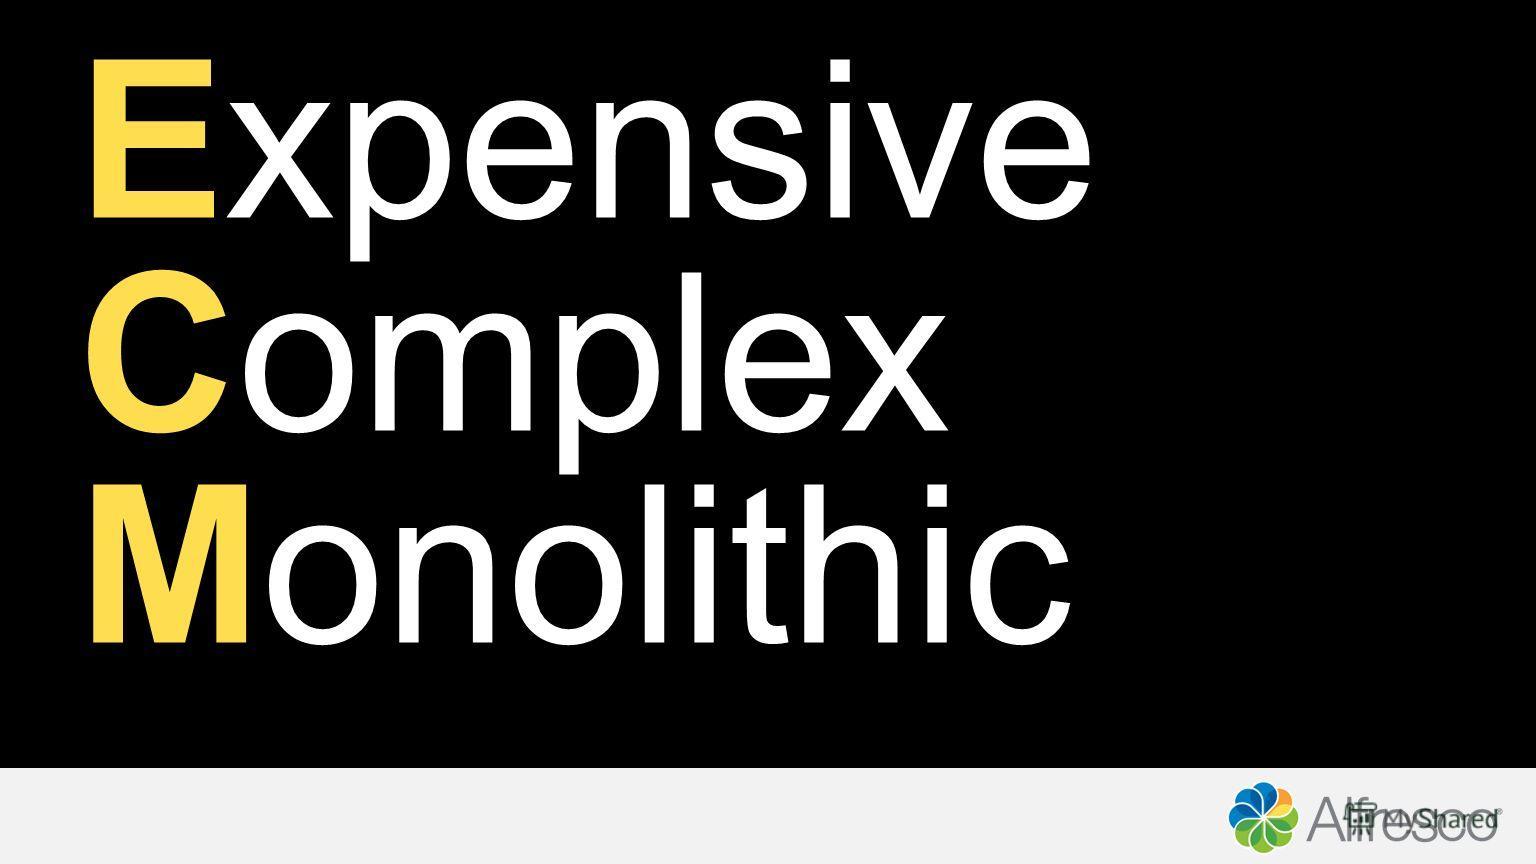 Expensive Complex Monolithic